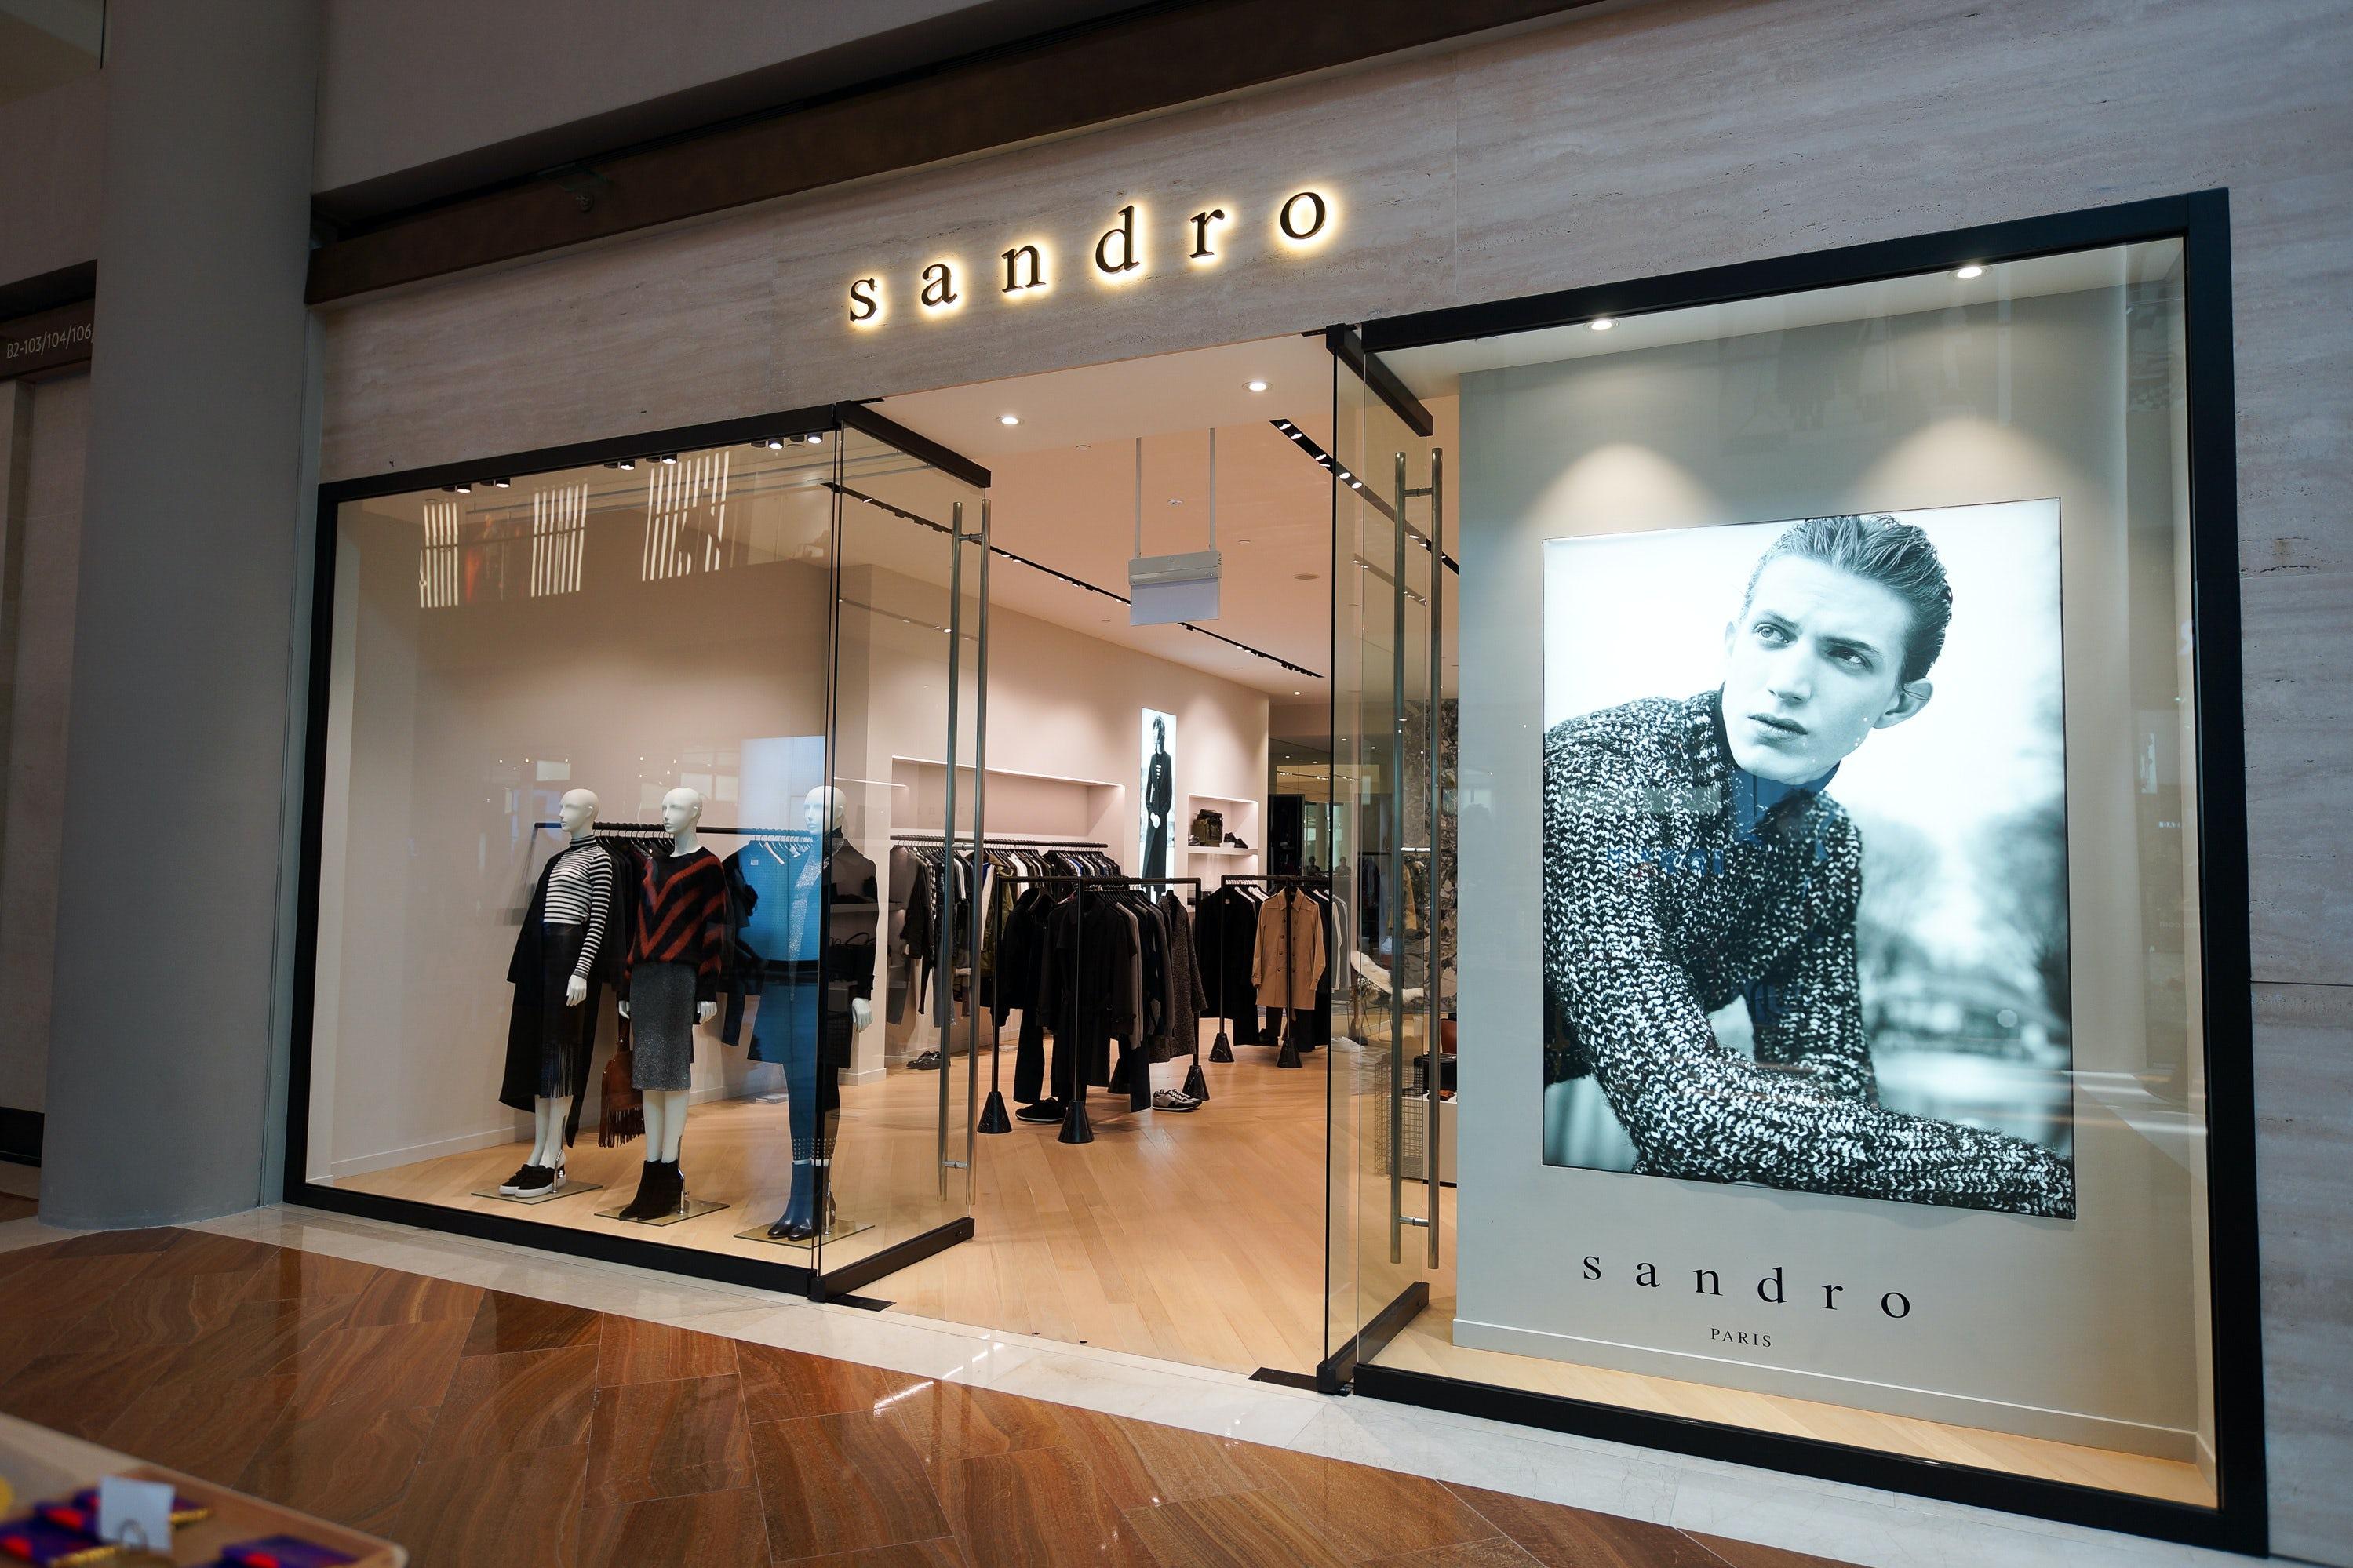 A Sandro store | Source: Shutterstock